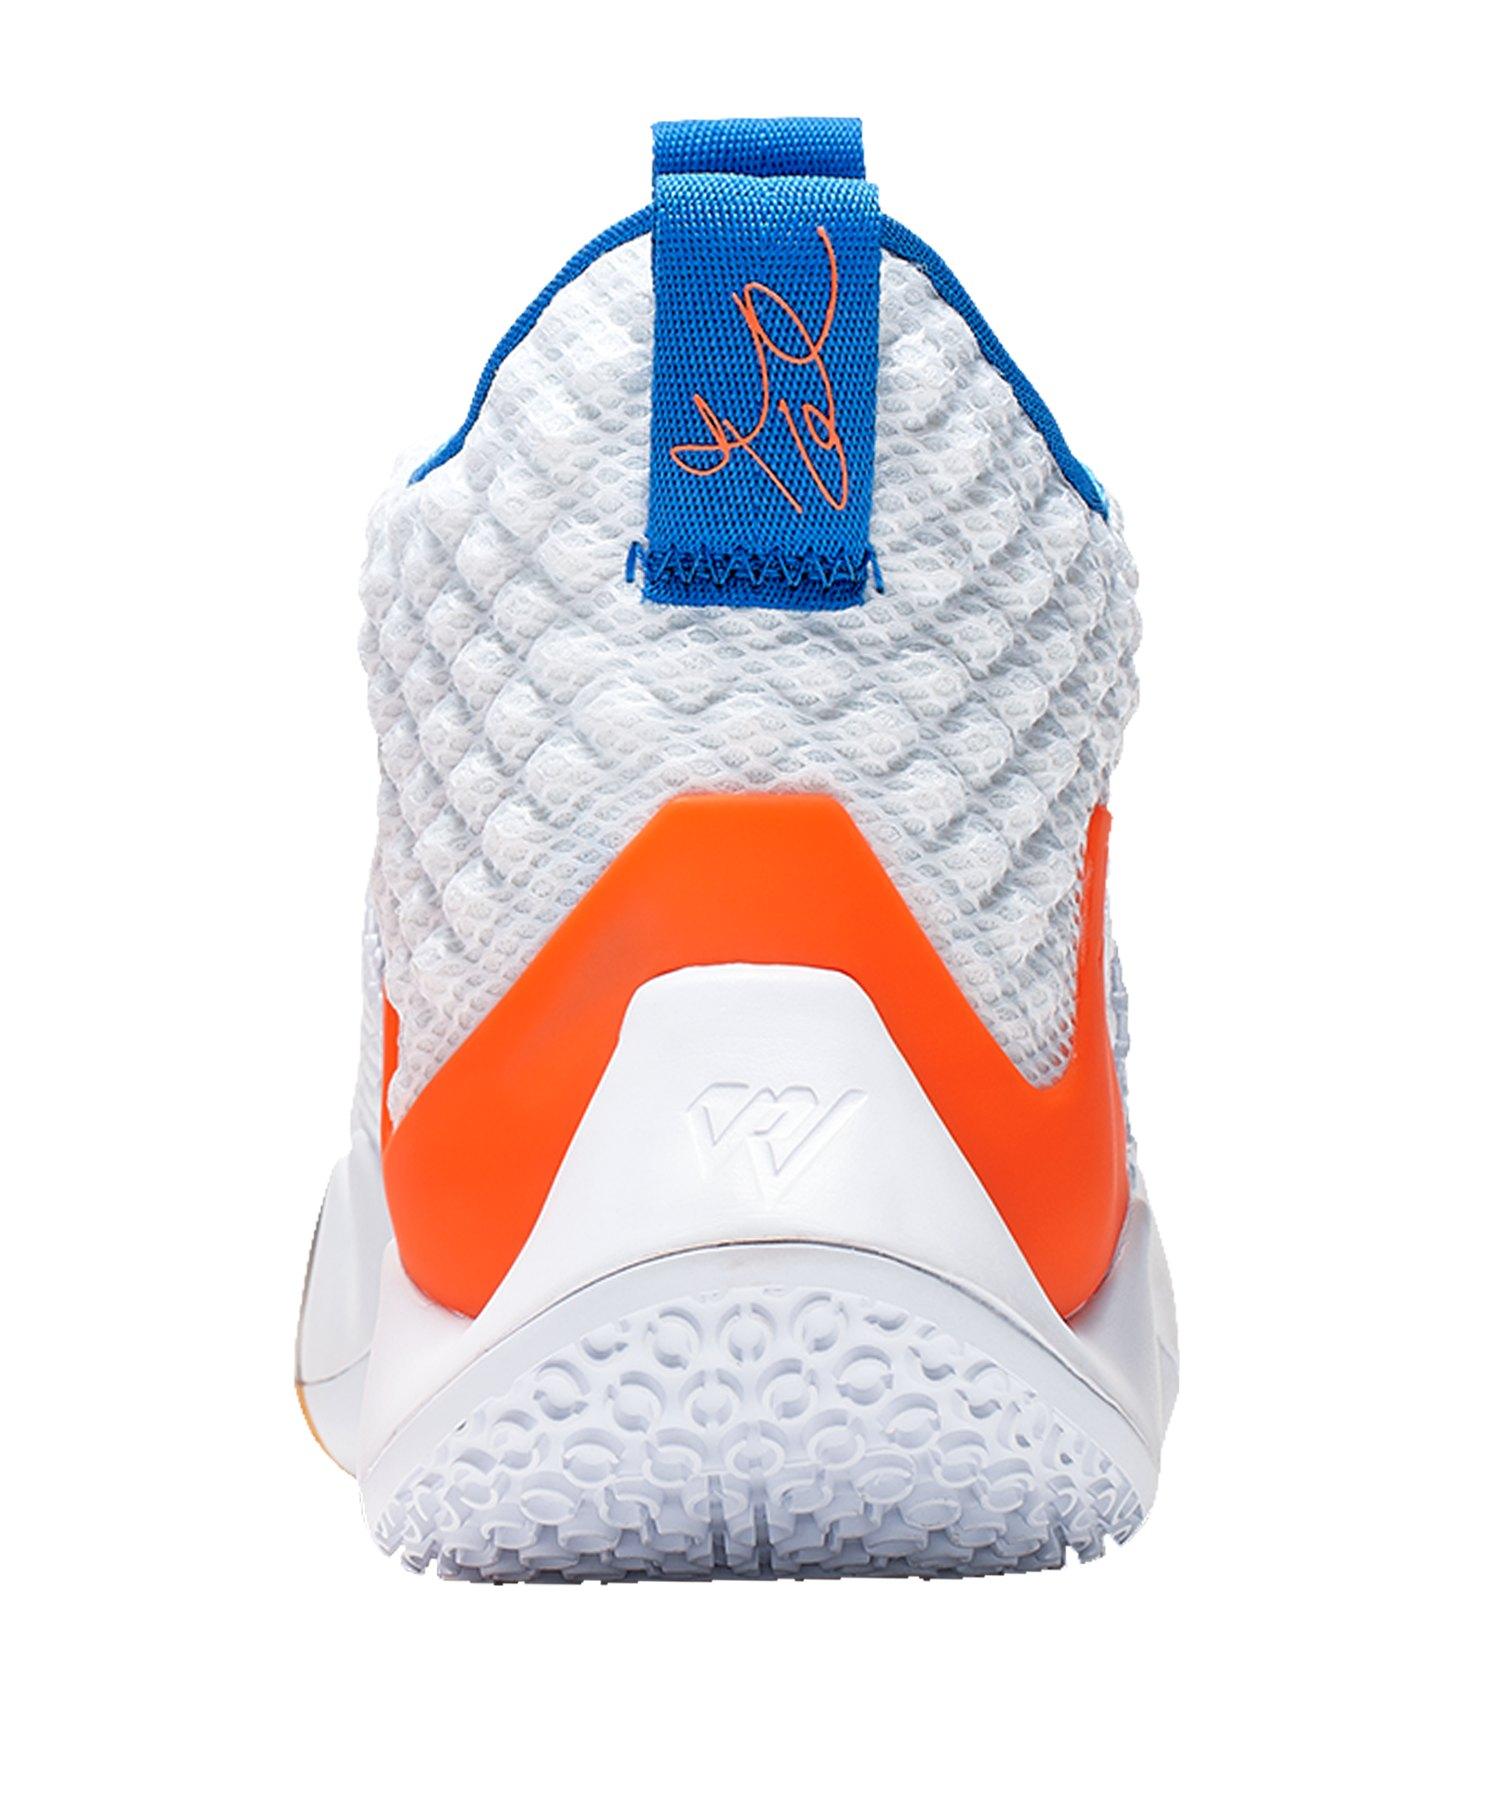 info for 8fbb0 bd84a ... Jordan Why Not Zer0.2 Sneaker Weiss Rot Blau F100 - weiss ...